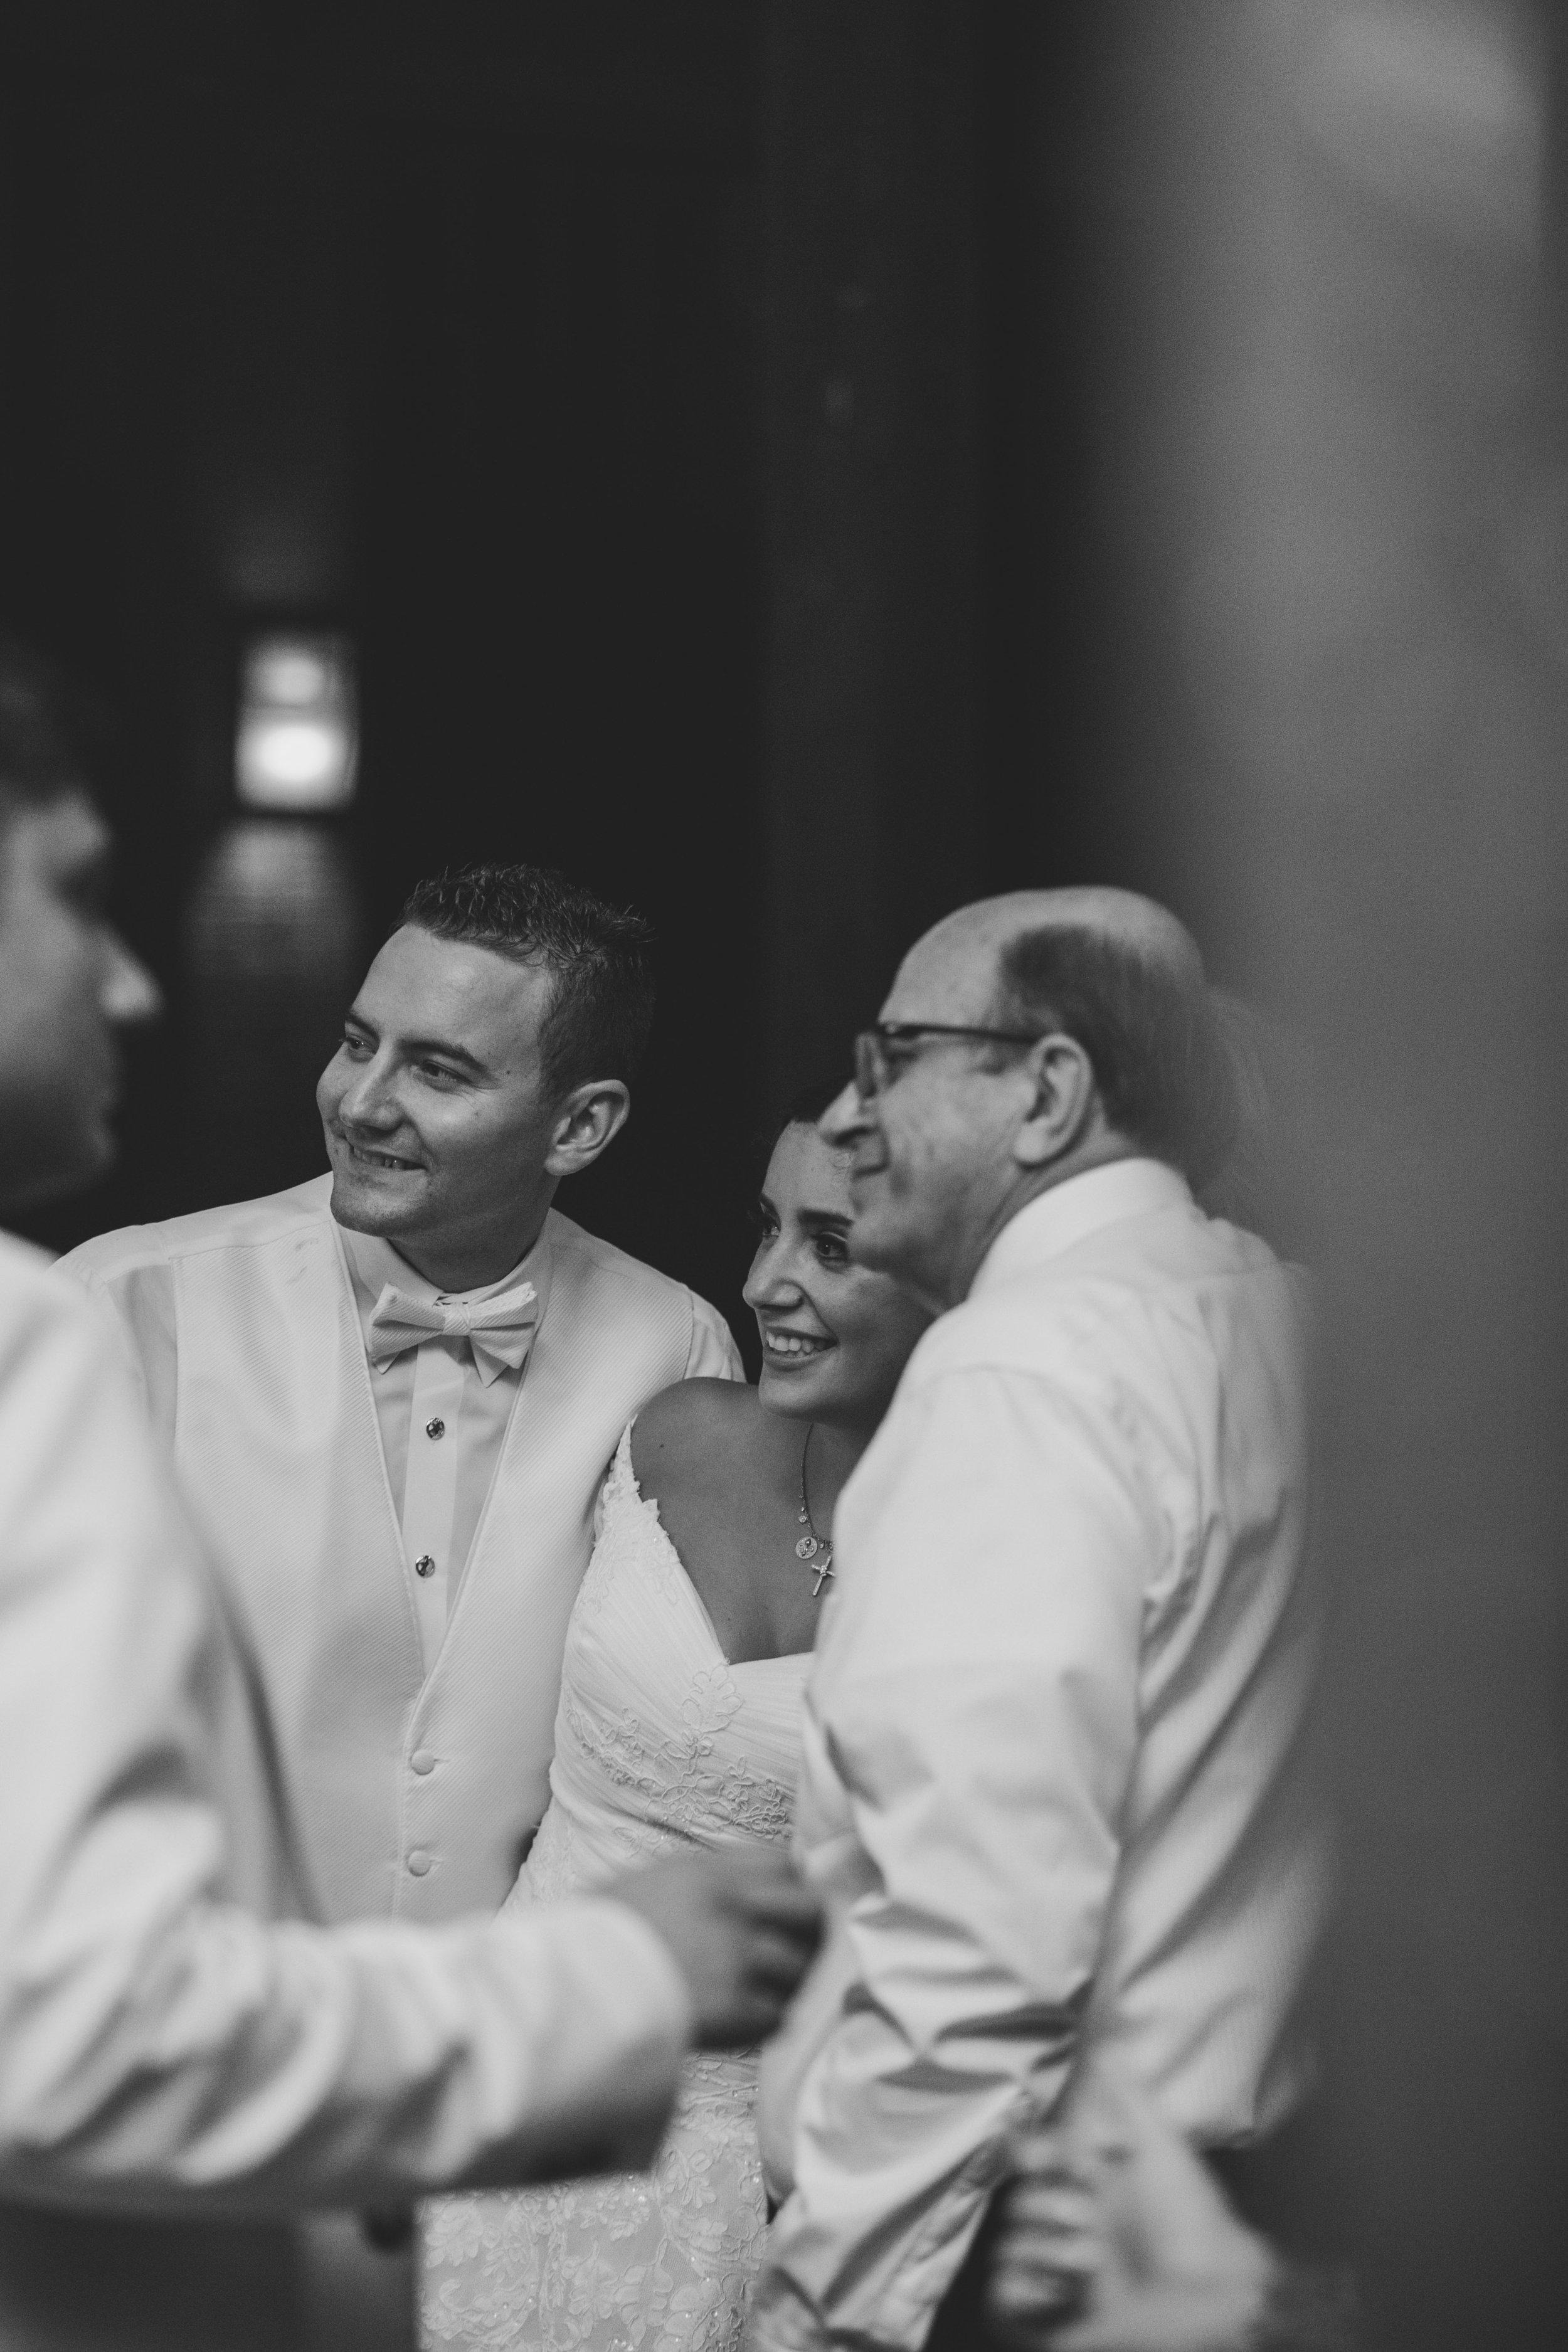 ATGI_Magali & Josh Wedding1_2S8A2613.jpg